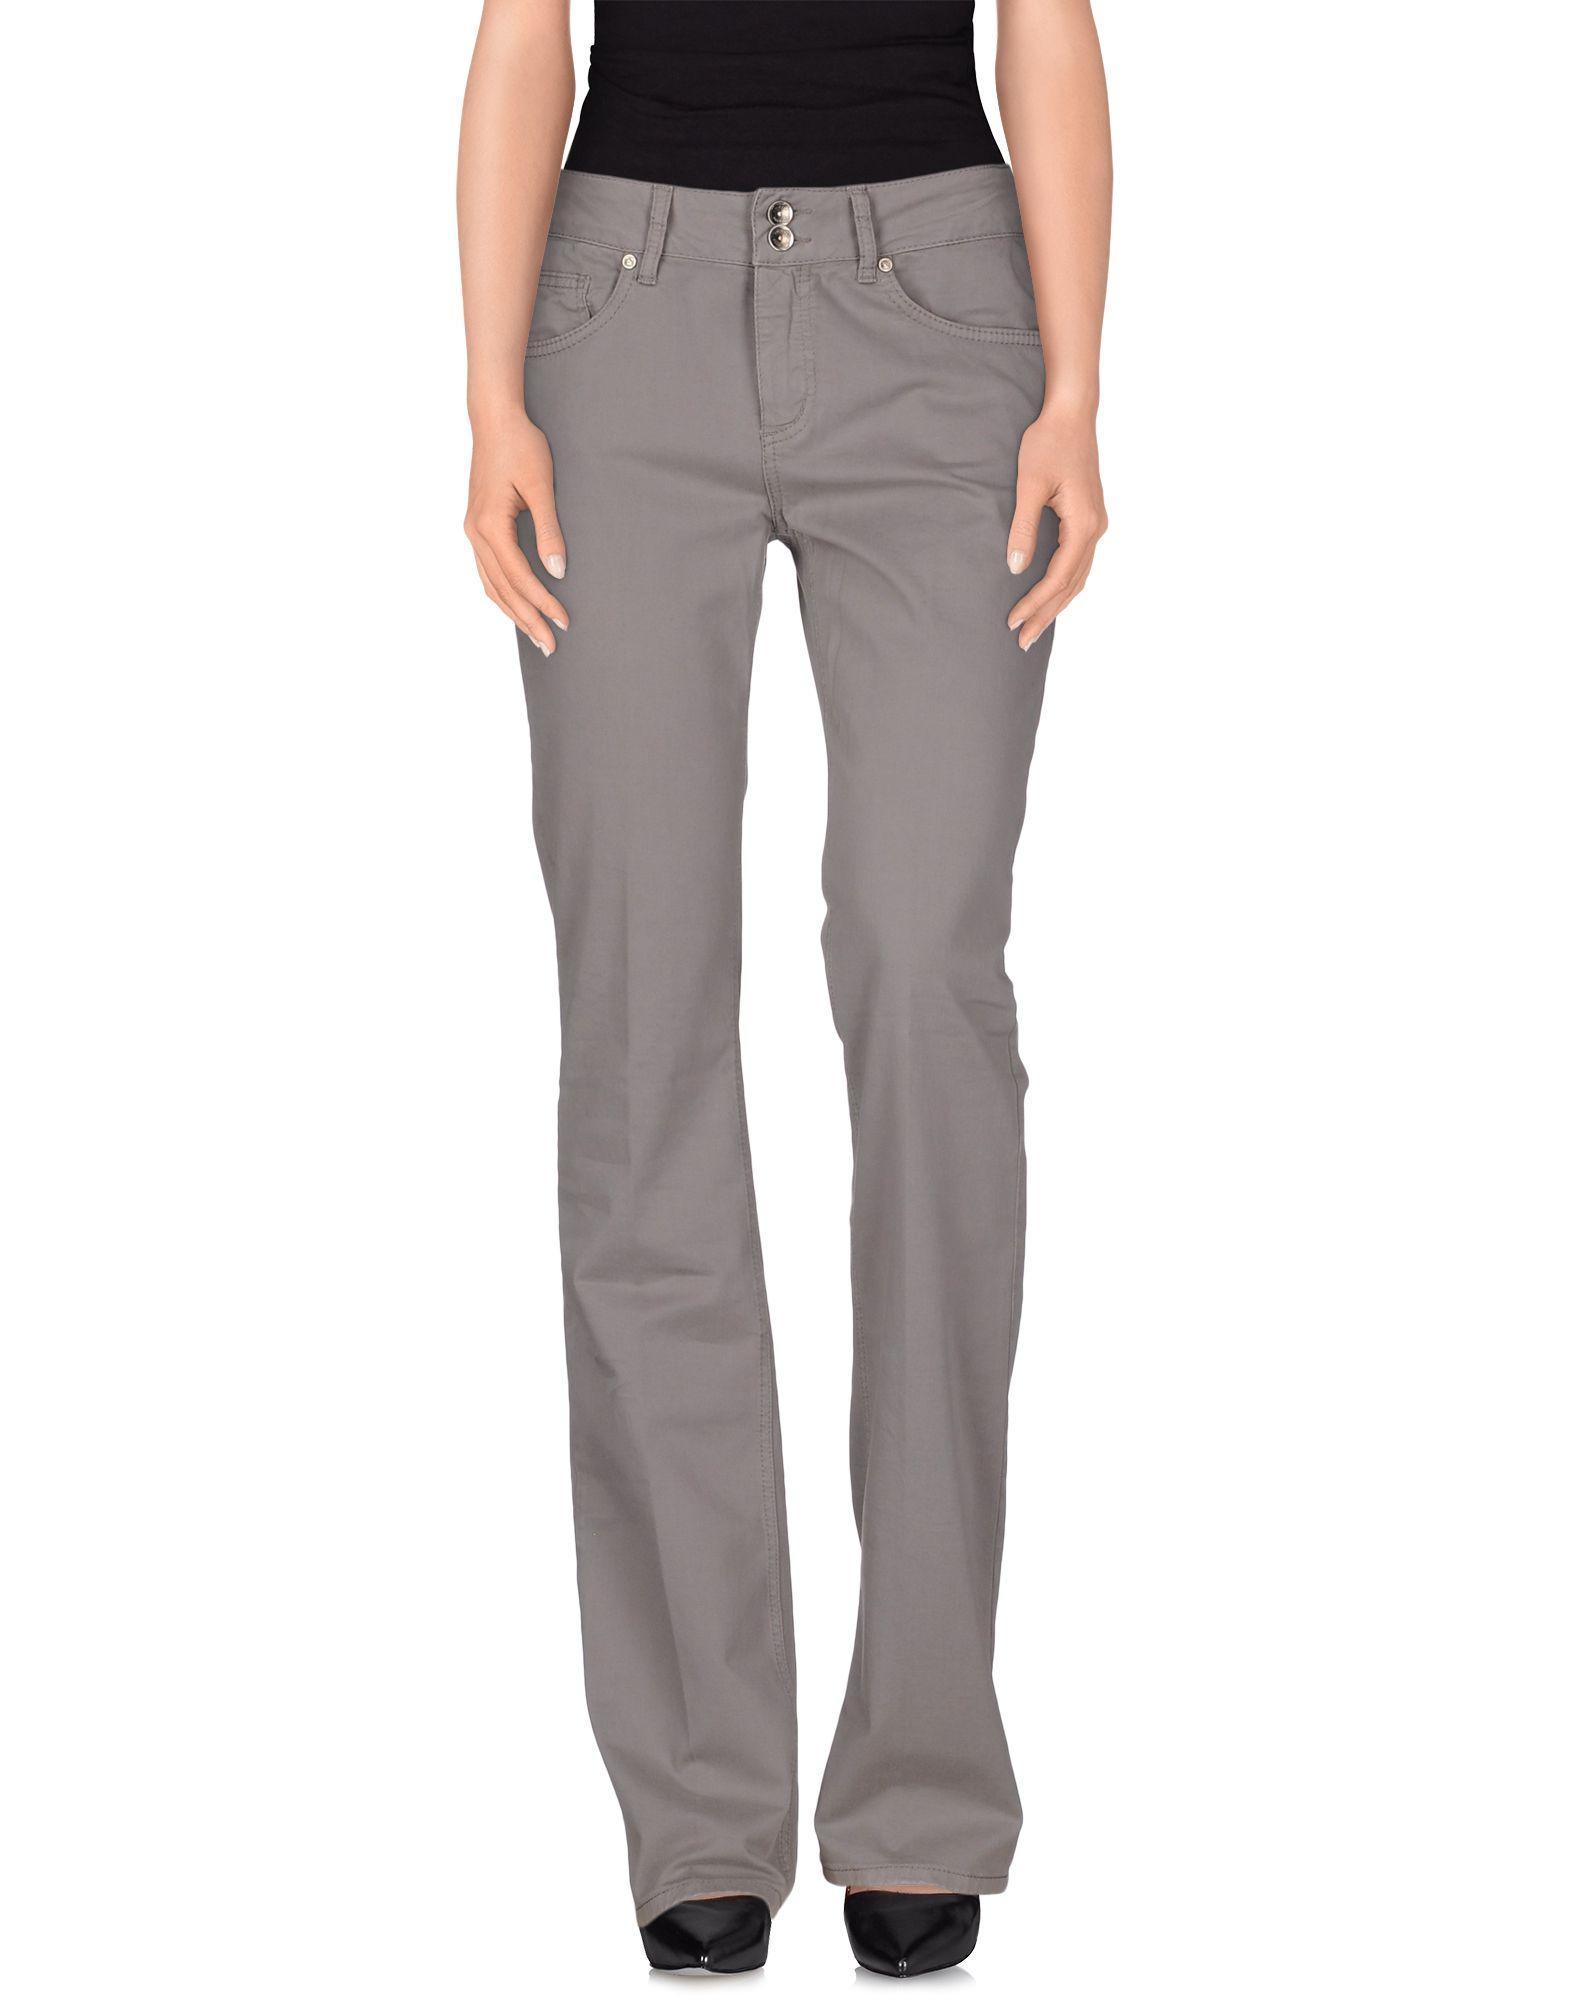 Liu •jo Casual Pants In Grey